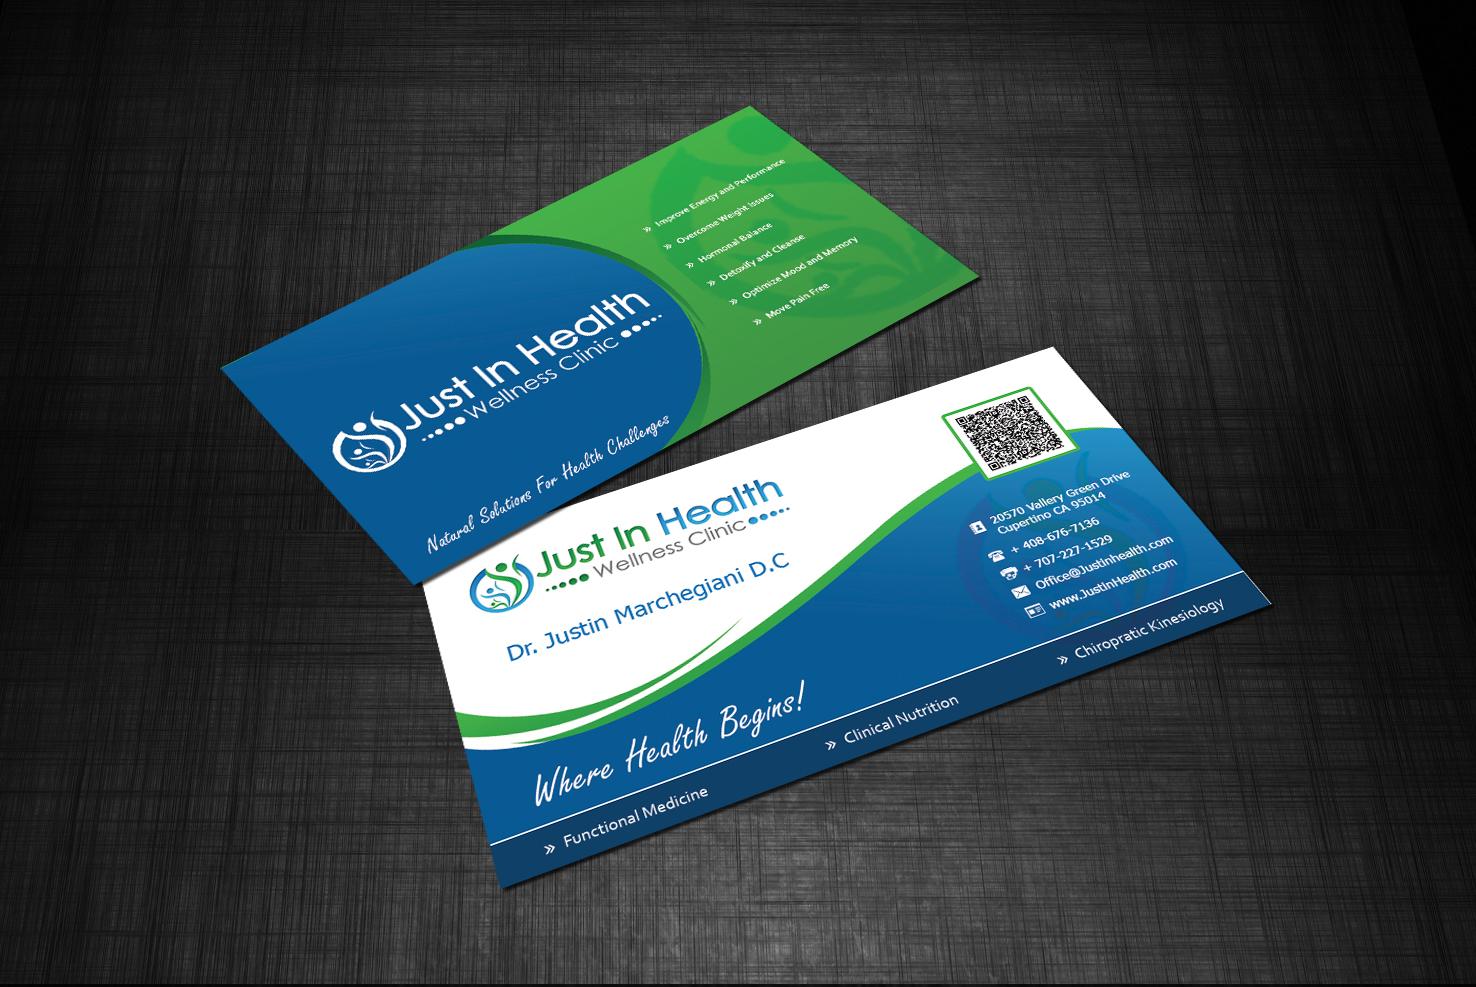 Real versatile technologies justinhealth business card mockup presentation v4 magicingreecefo Image collections